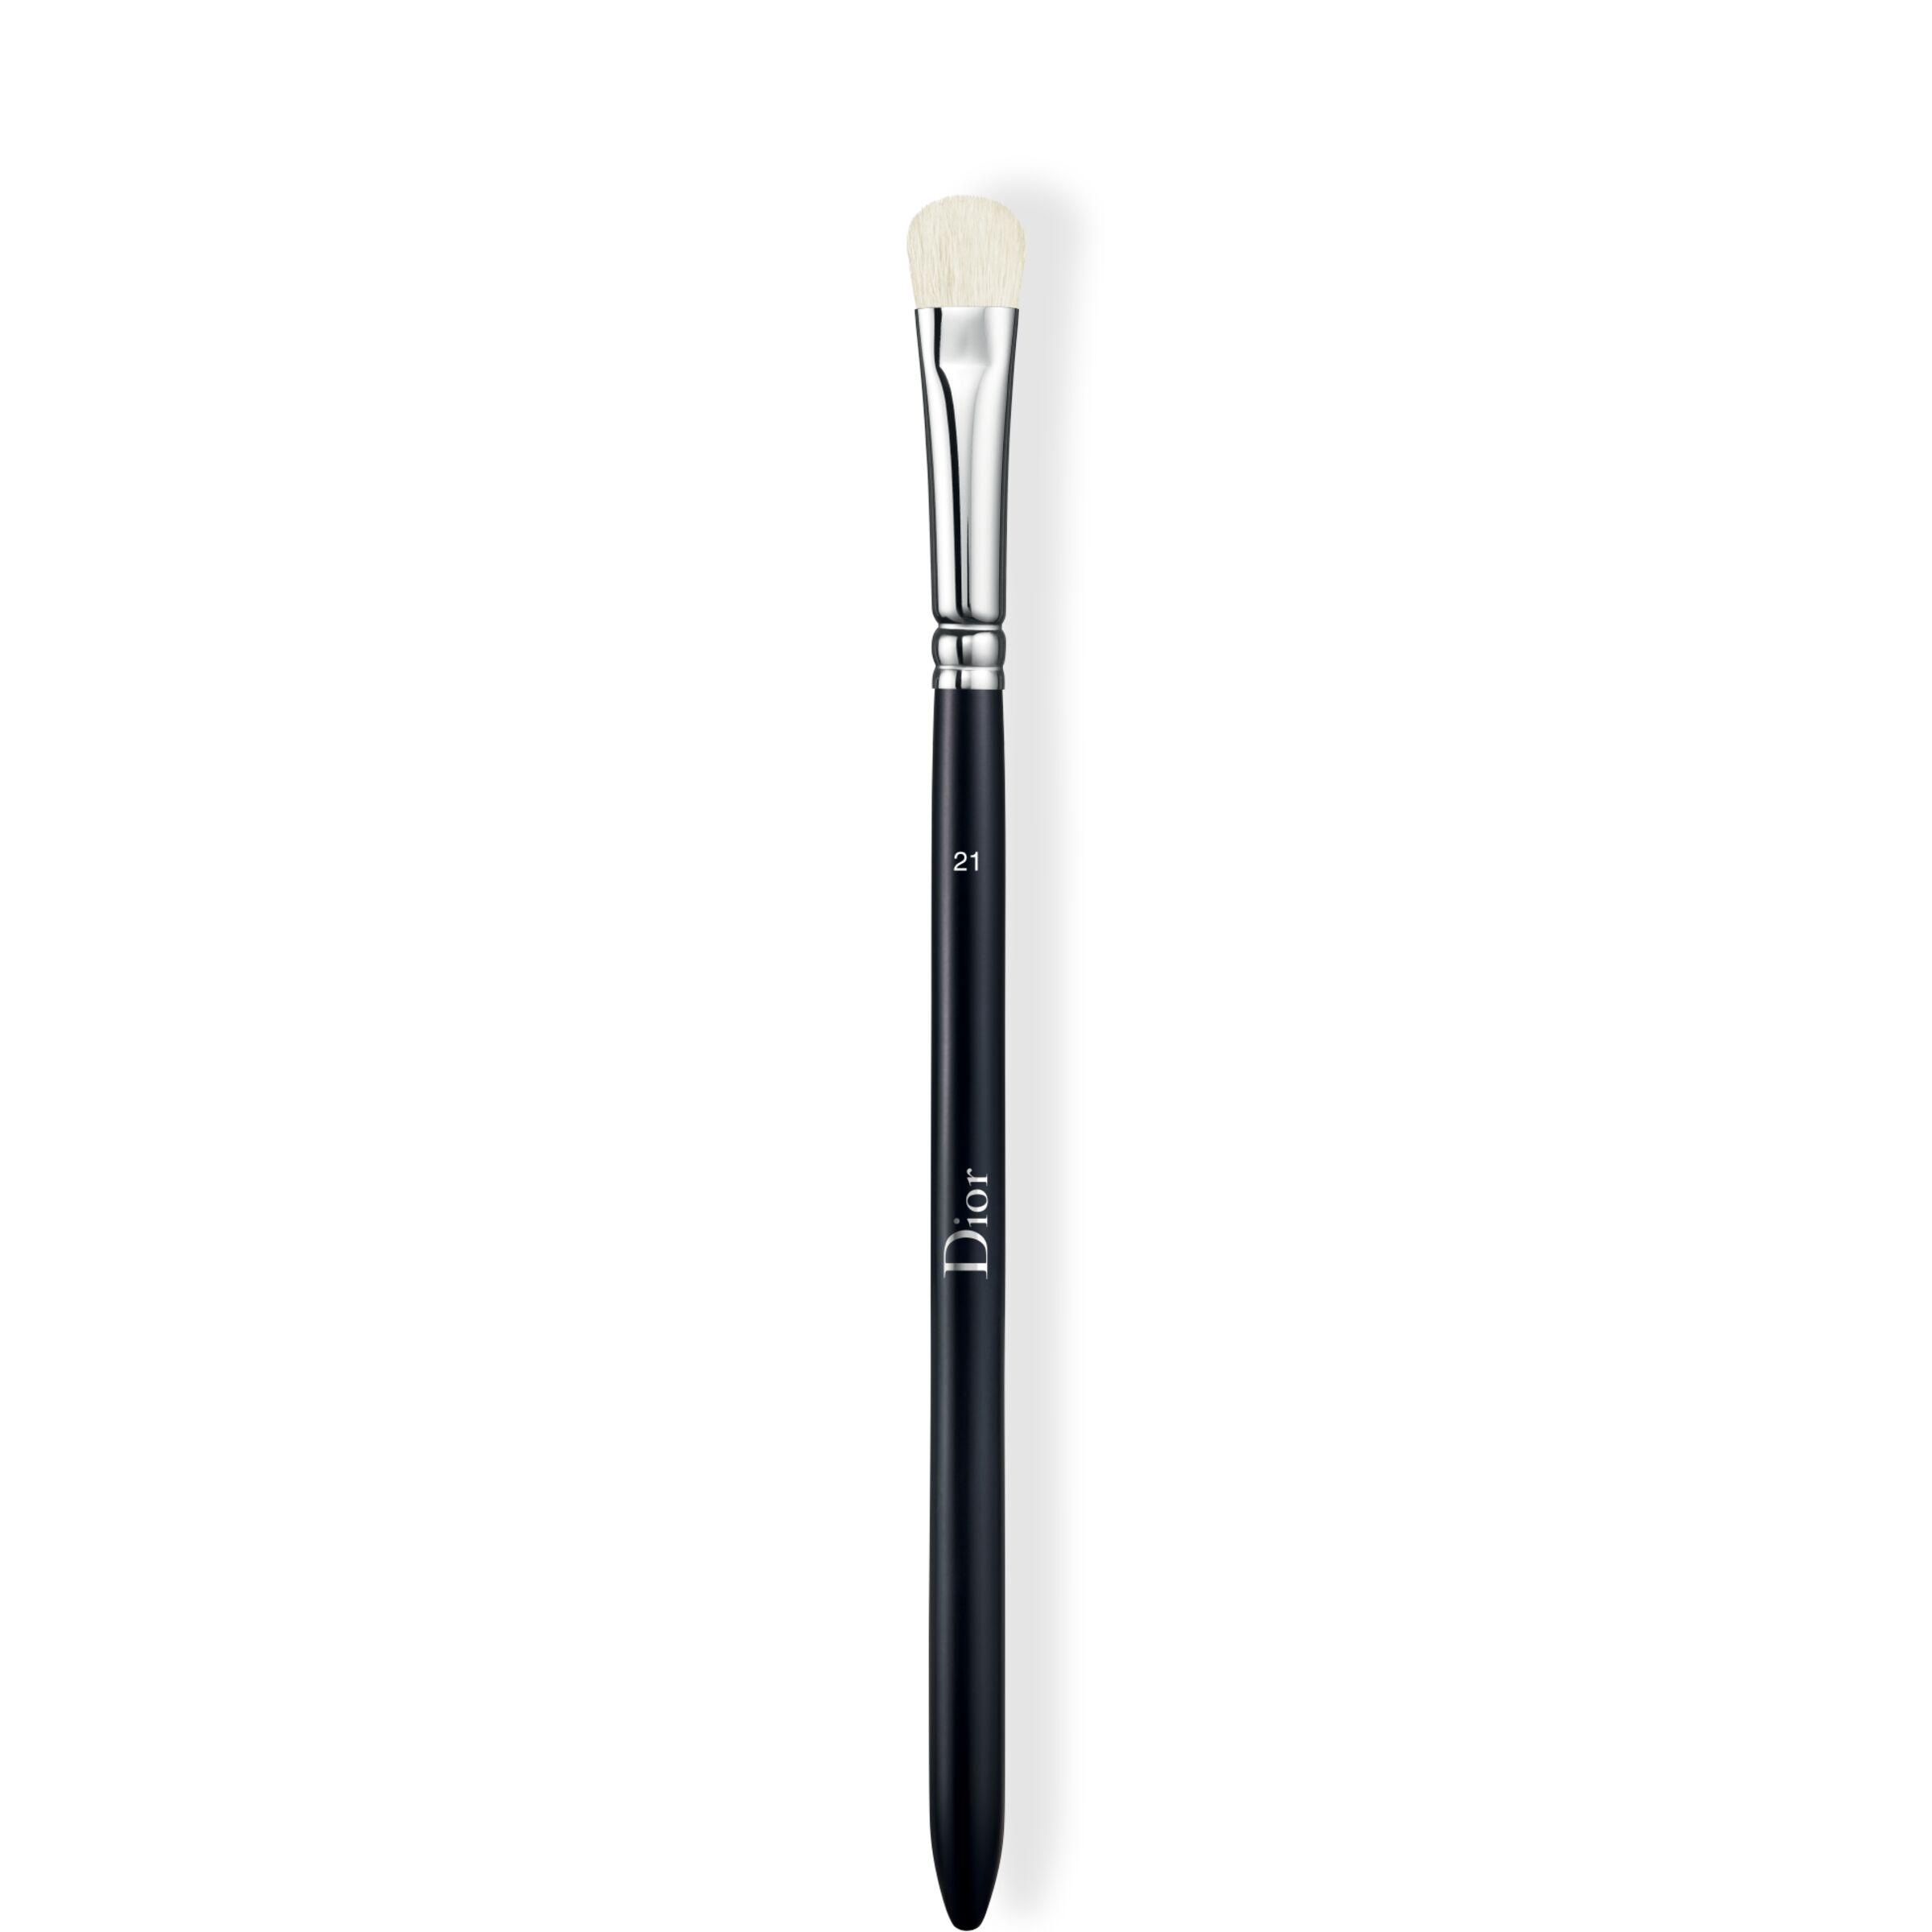 Dior Backstage Eyeshadow Shader Brush N°21